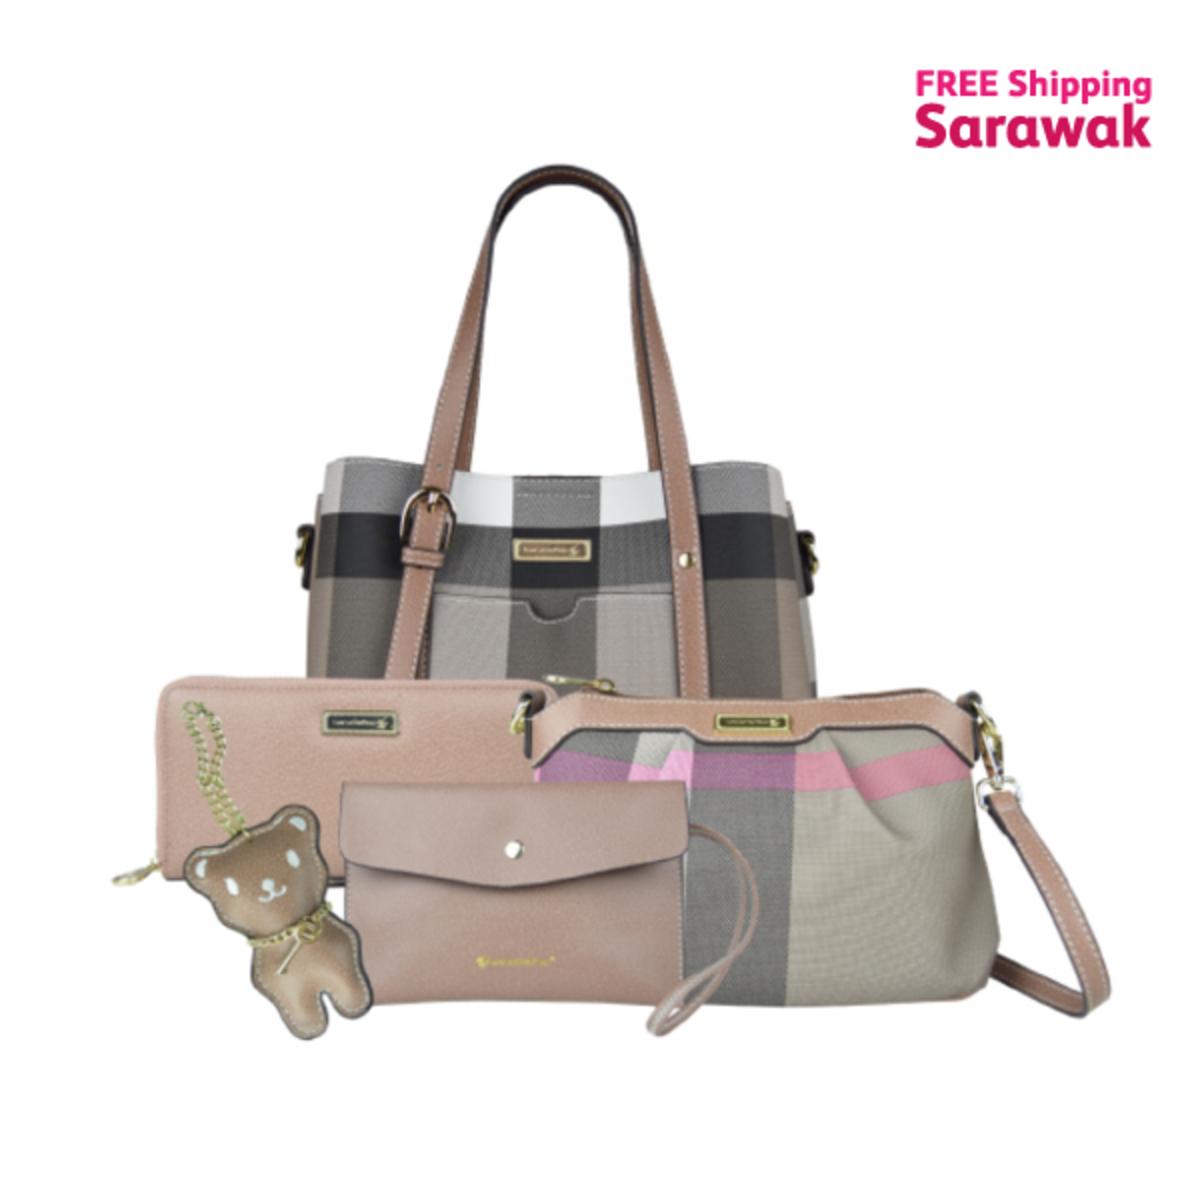 baa774b29b2 [SW] Lancaster Polo Fiona Satchel Handbag Set | Go Shop